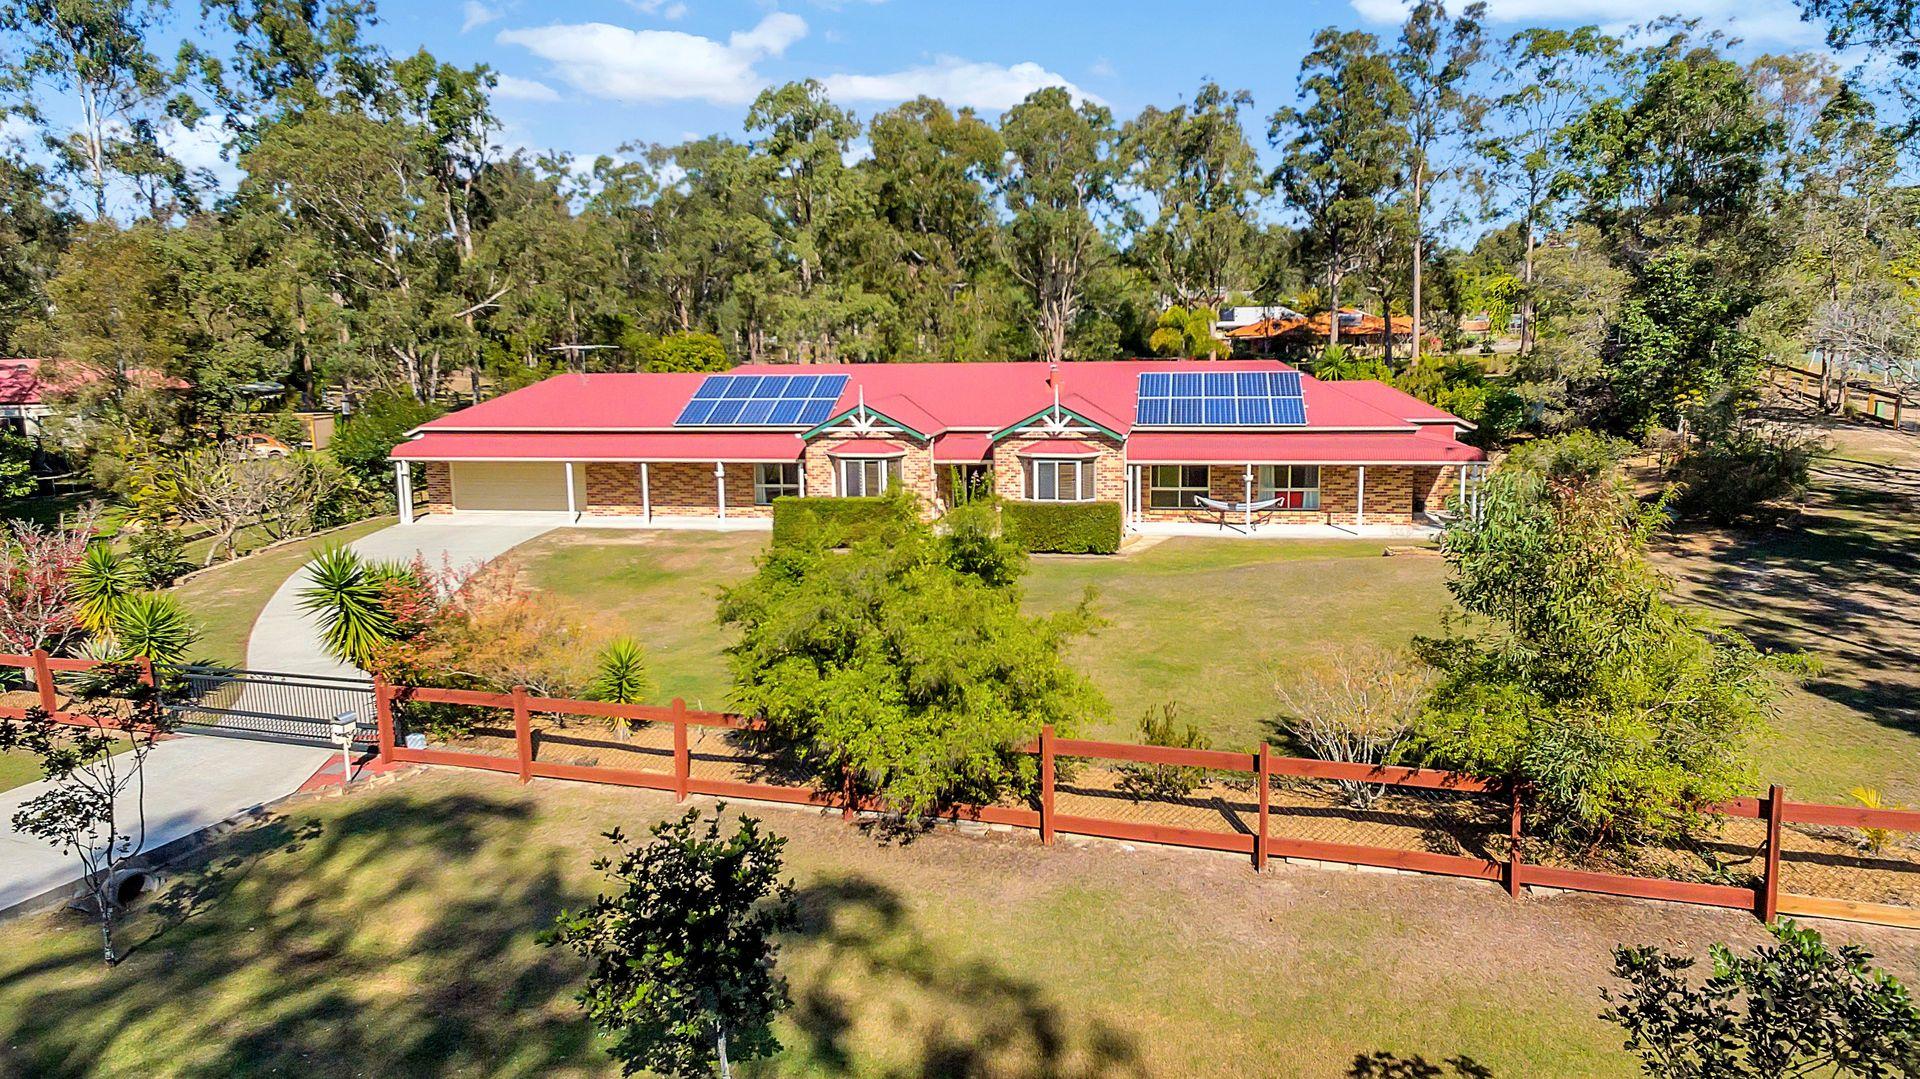 10-12 Spinebill Drive, Greenbank QLD 4124, Image 0